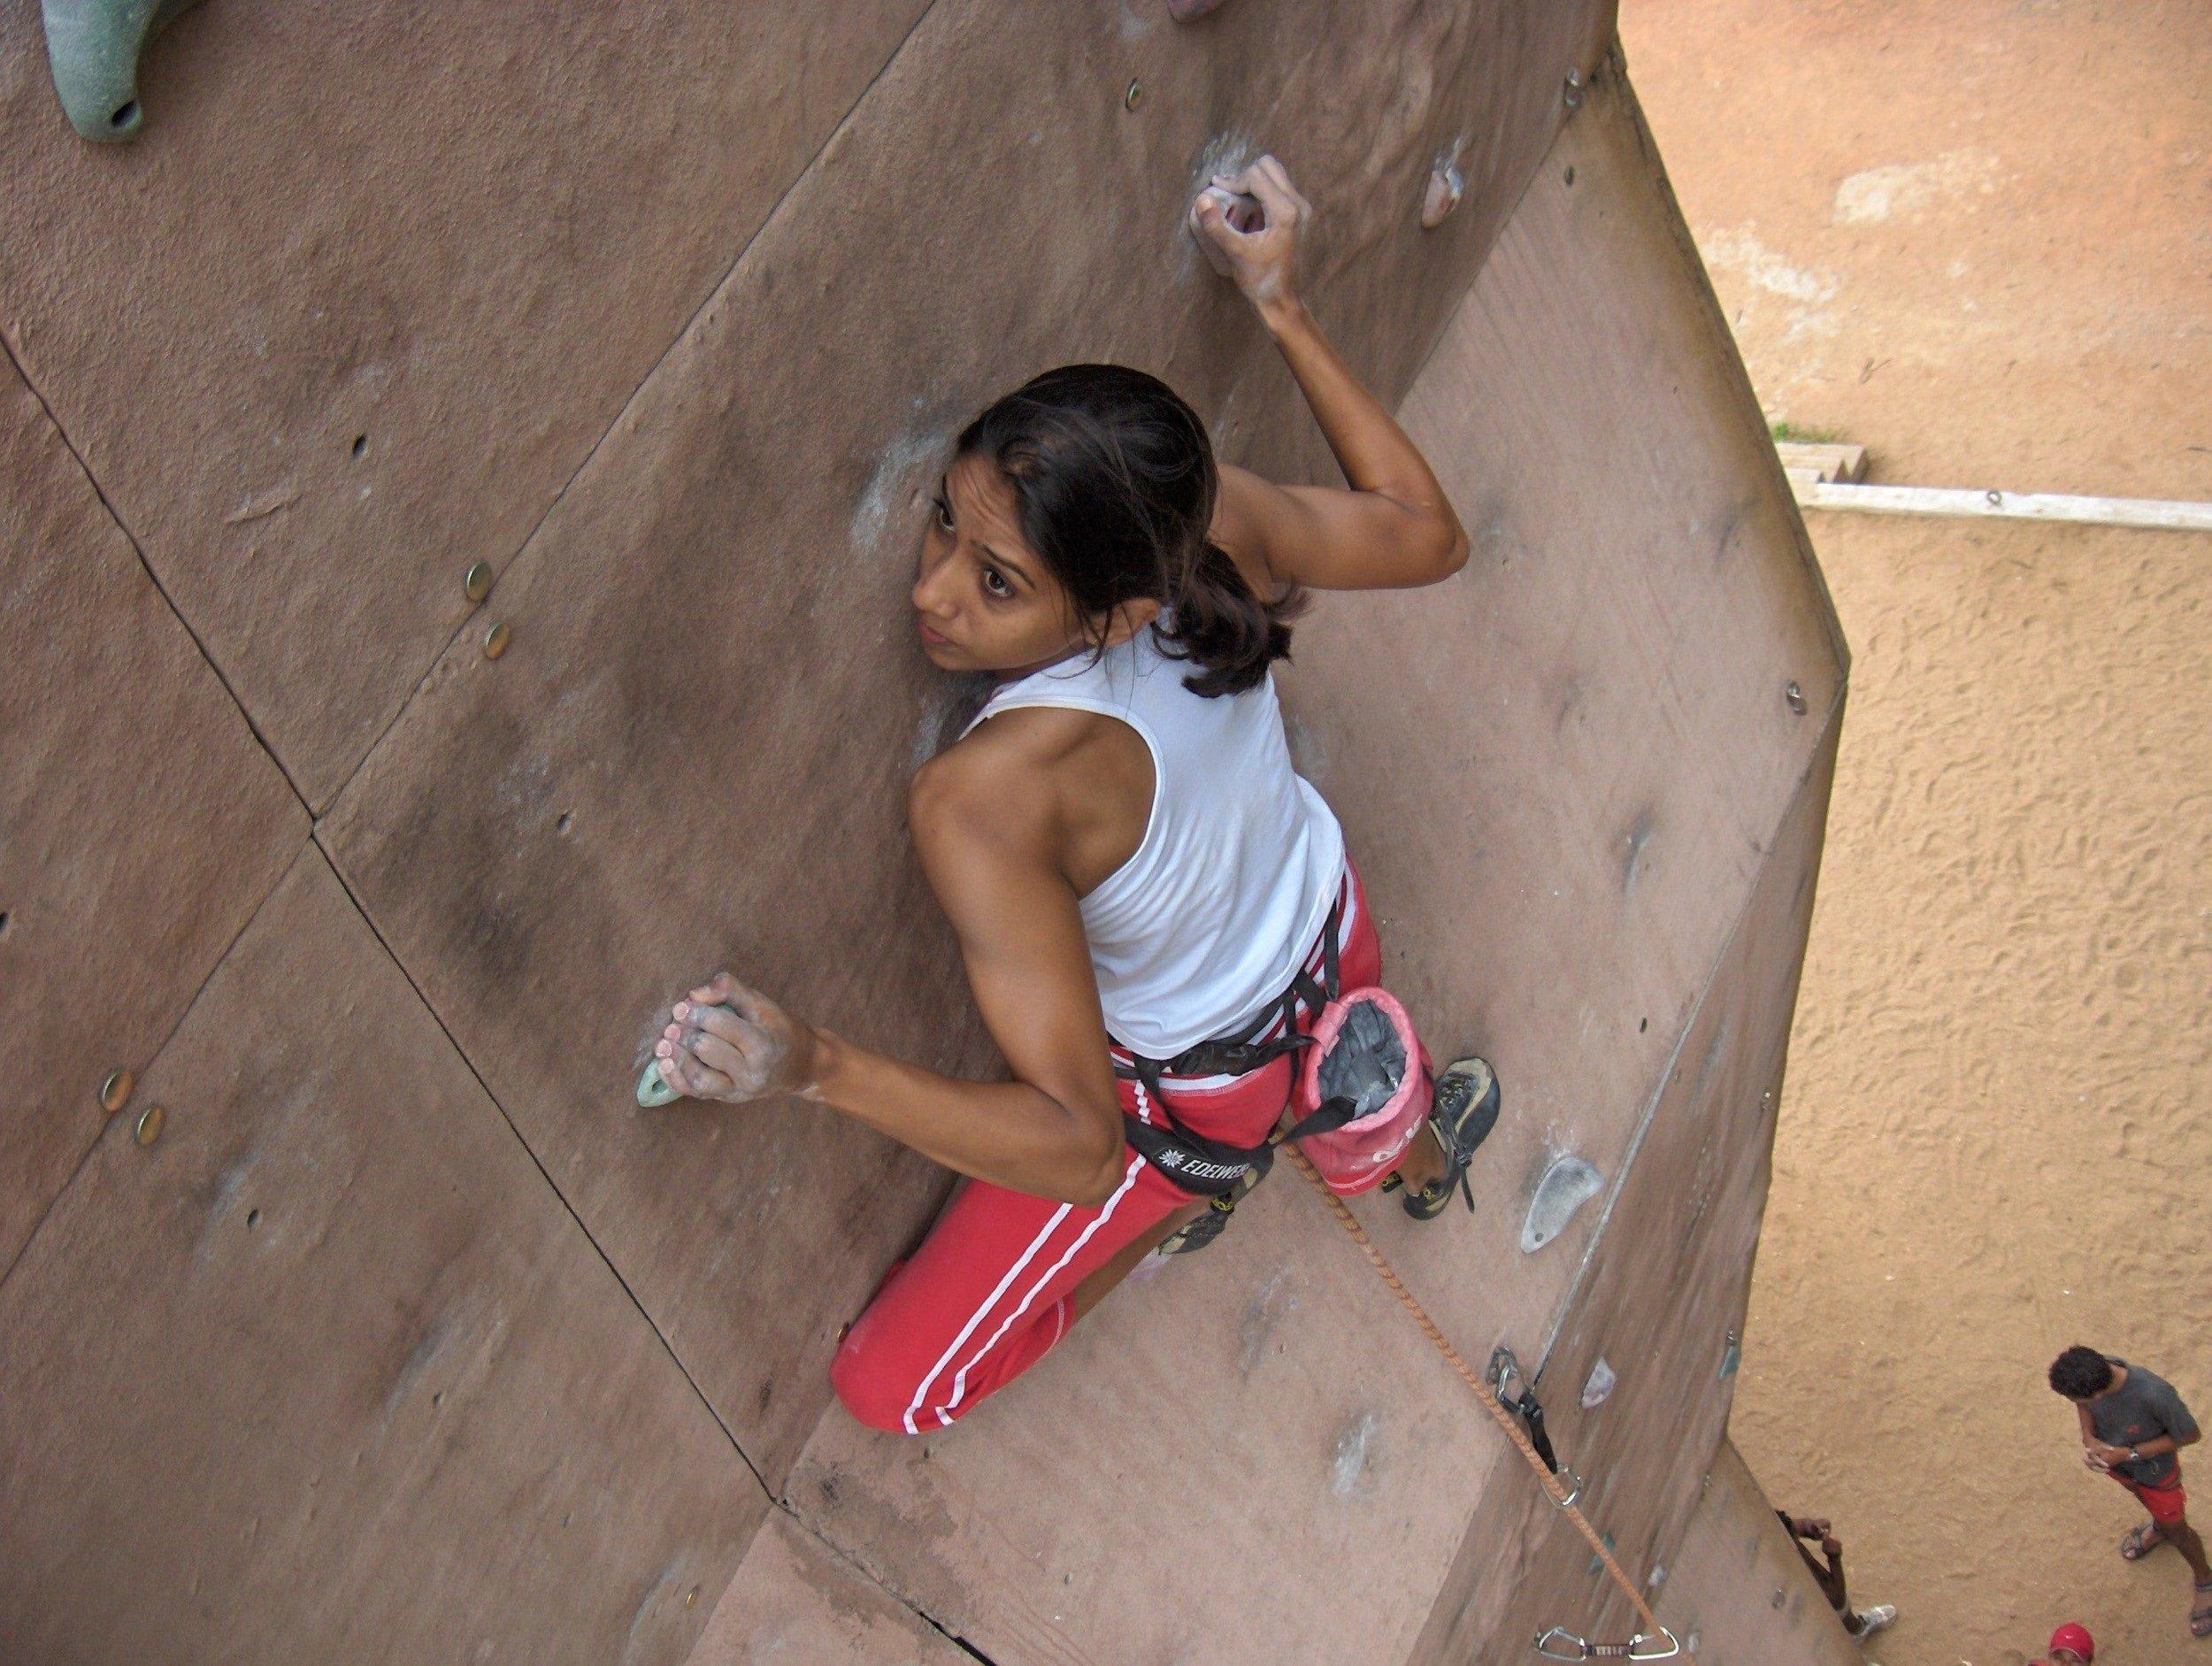 Archana Jadav training, circa 2005, for World Championships 2.jpg